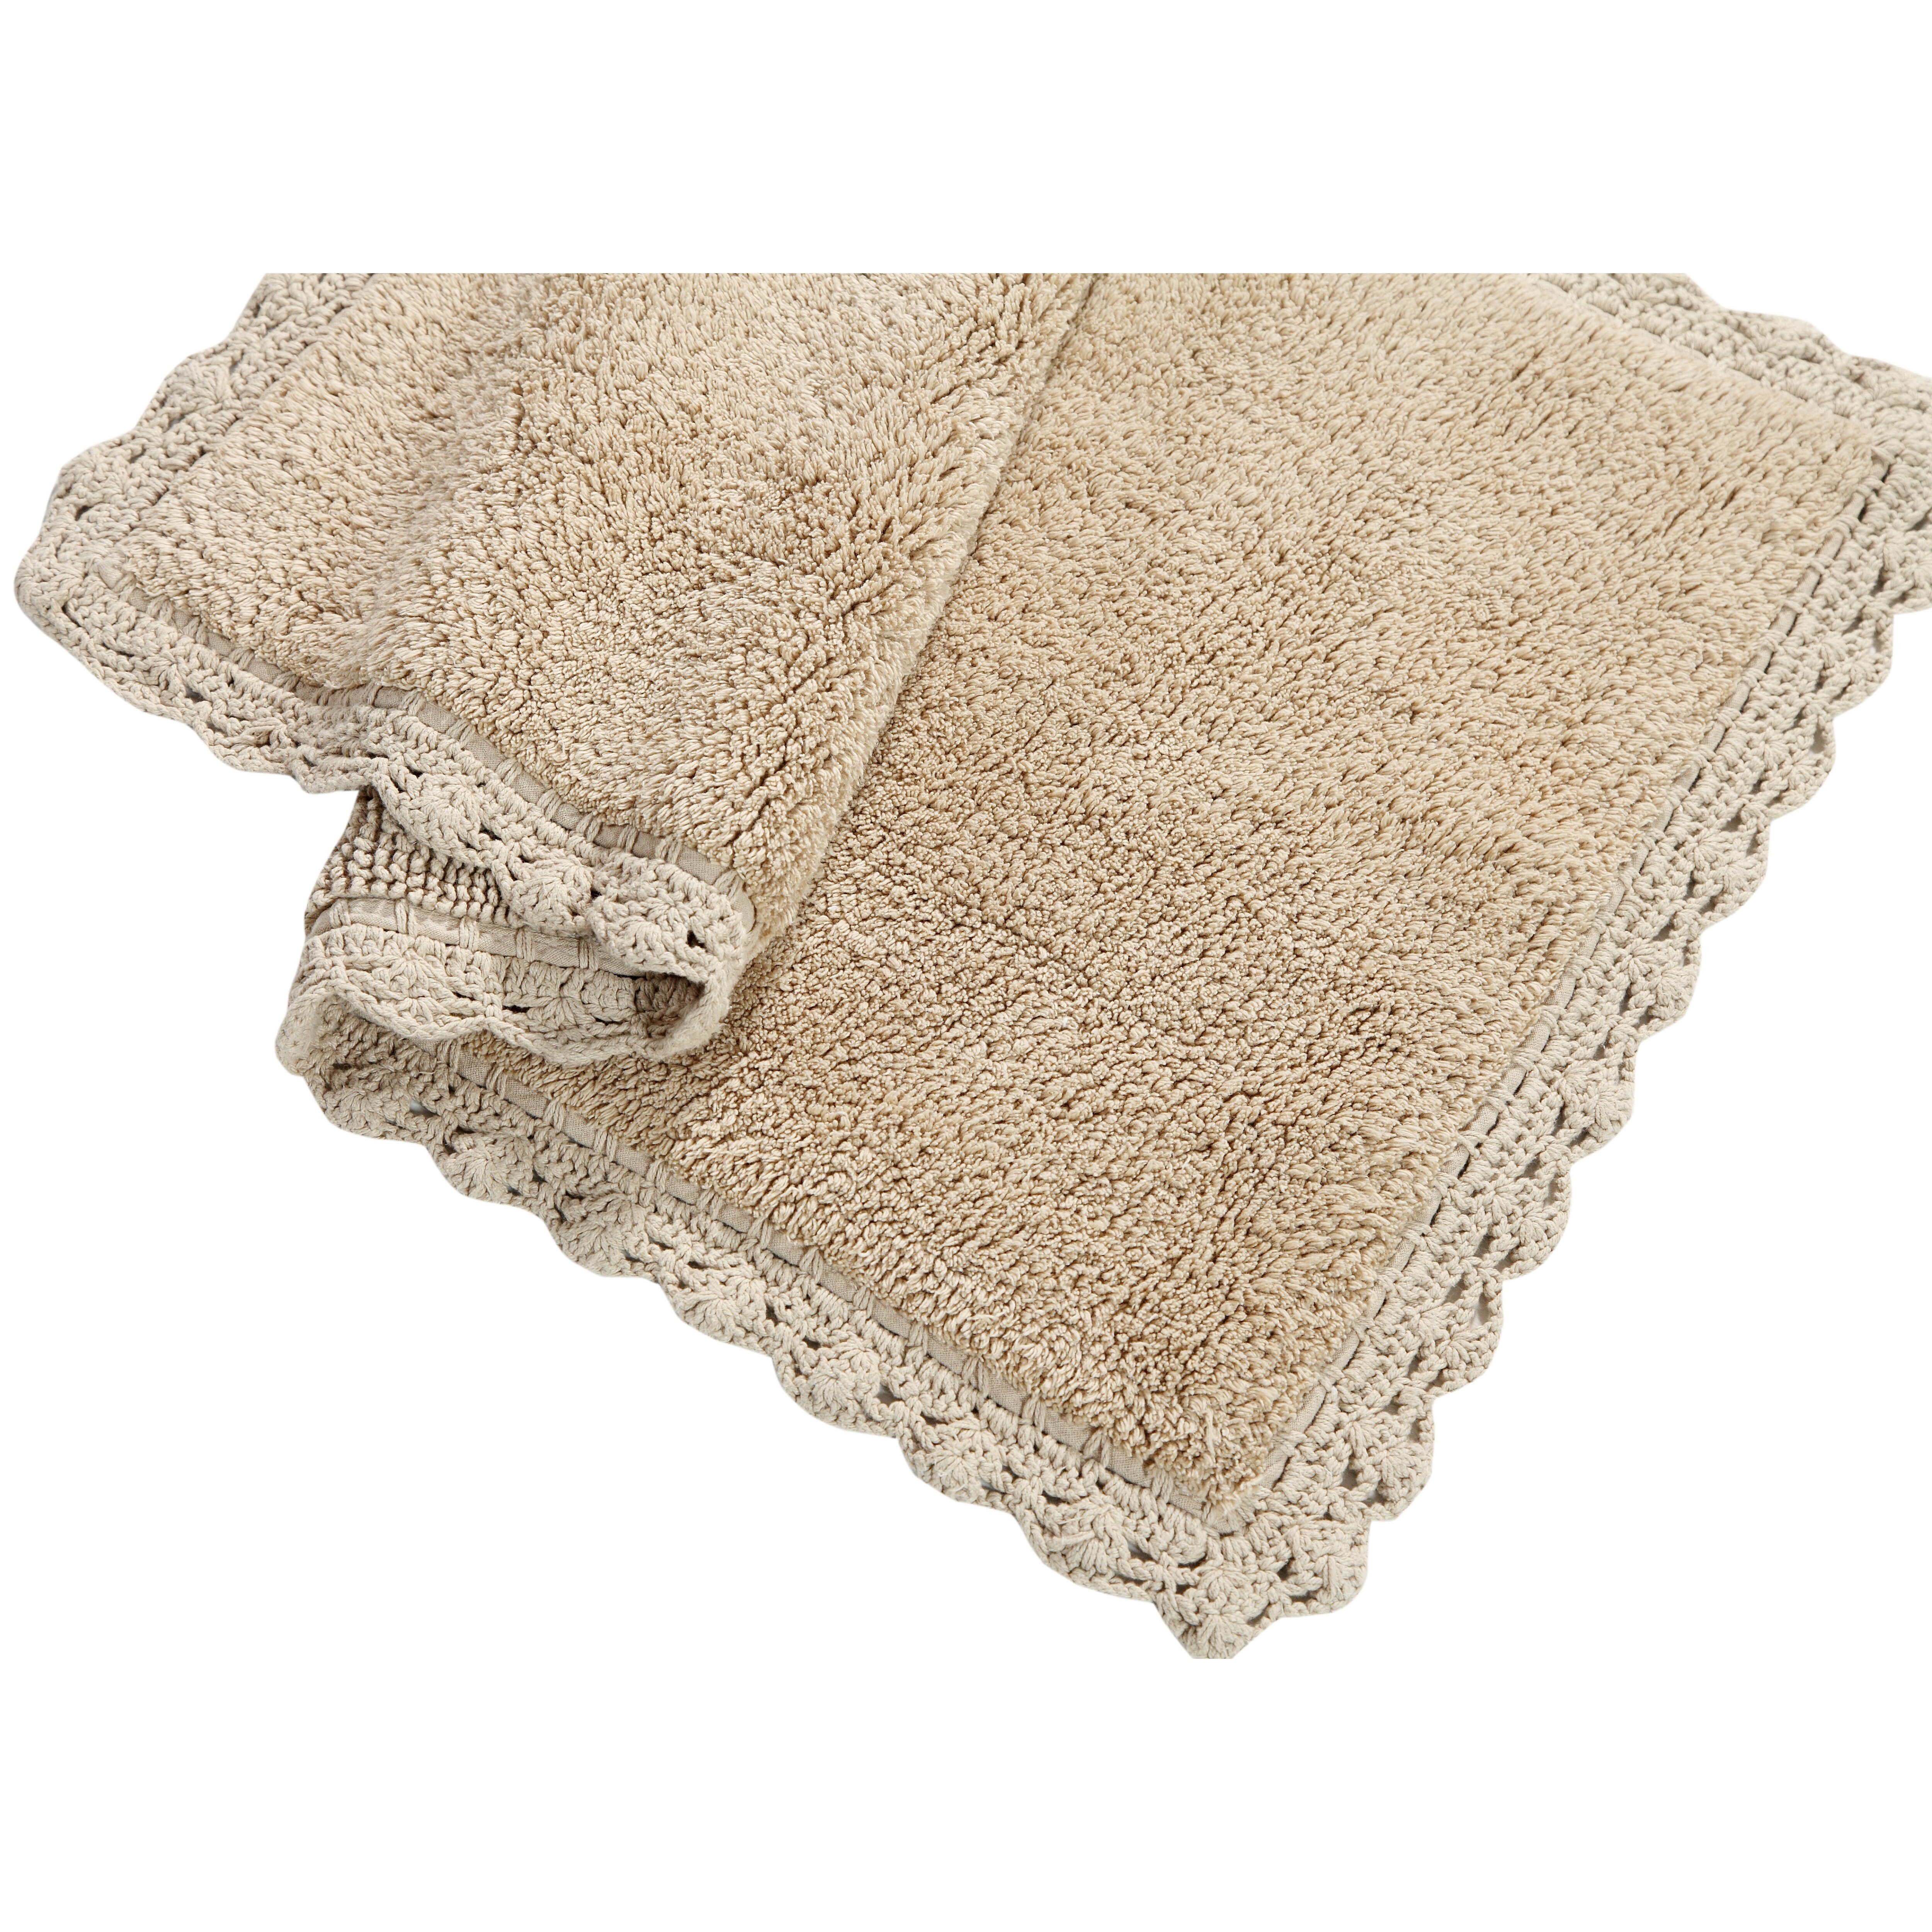 Bathroom Rugs Set Chesapeake Crochet 2 Piece Bath Rug Set Reviews Wayfair